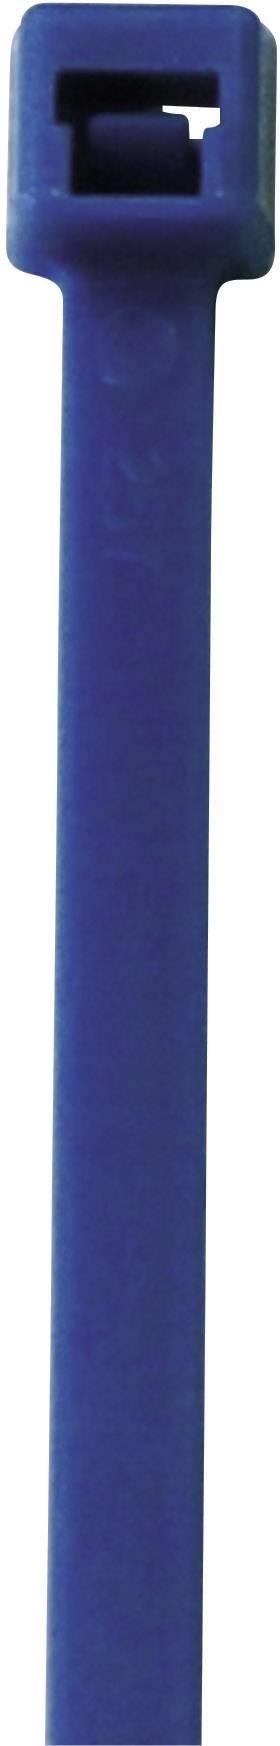 Neonska kabelska vezica, fluorescenčna (D x Š) 285 mm x 4.6 mm modra, 50 kosov, PB Fastener